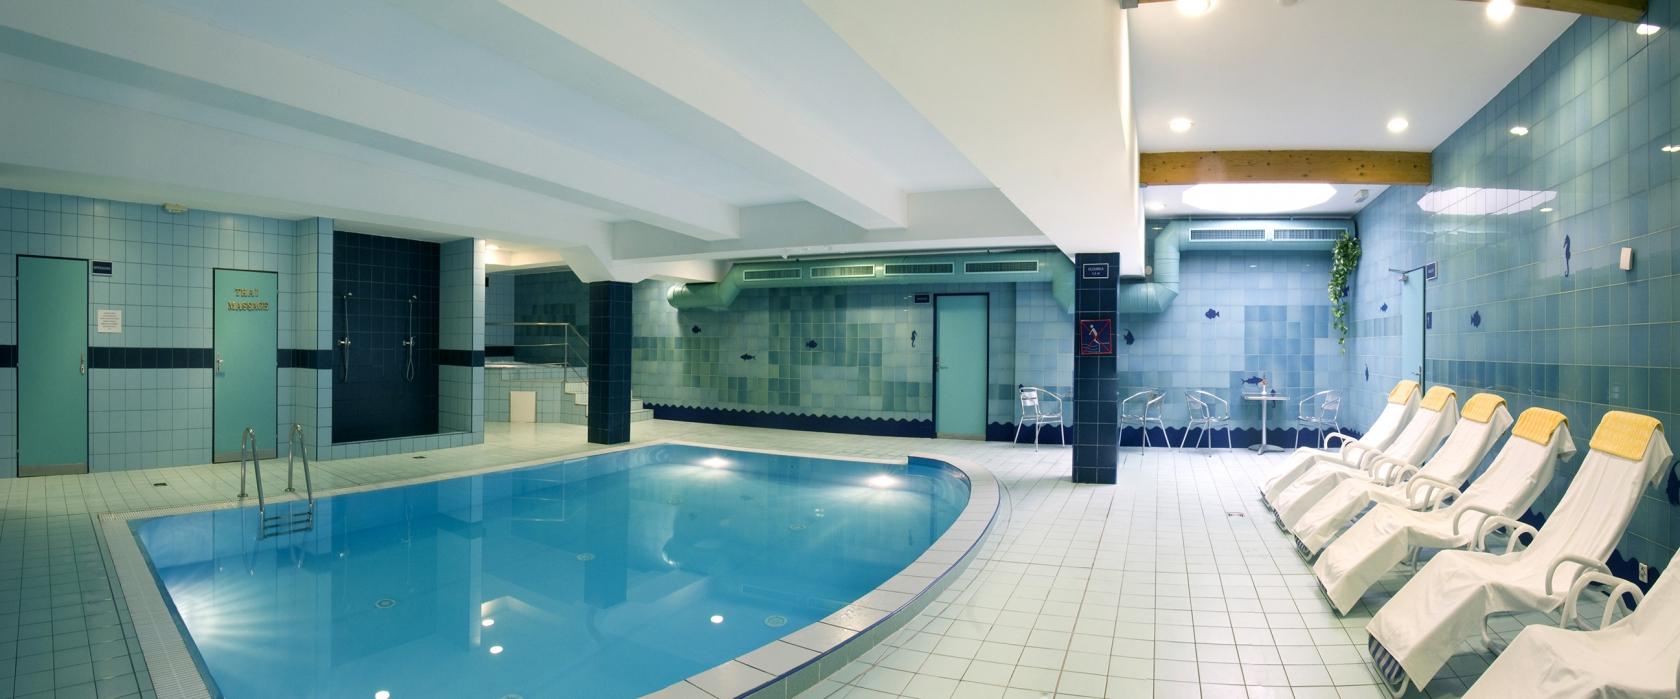 Wellness fitness center best western premier hotel for Wellness hotel